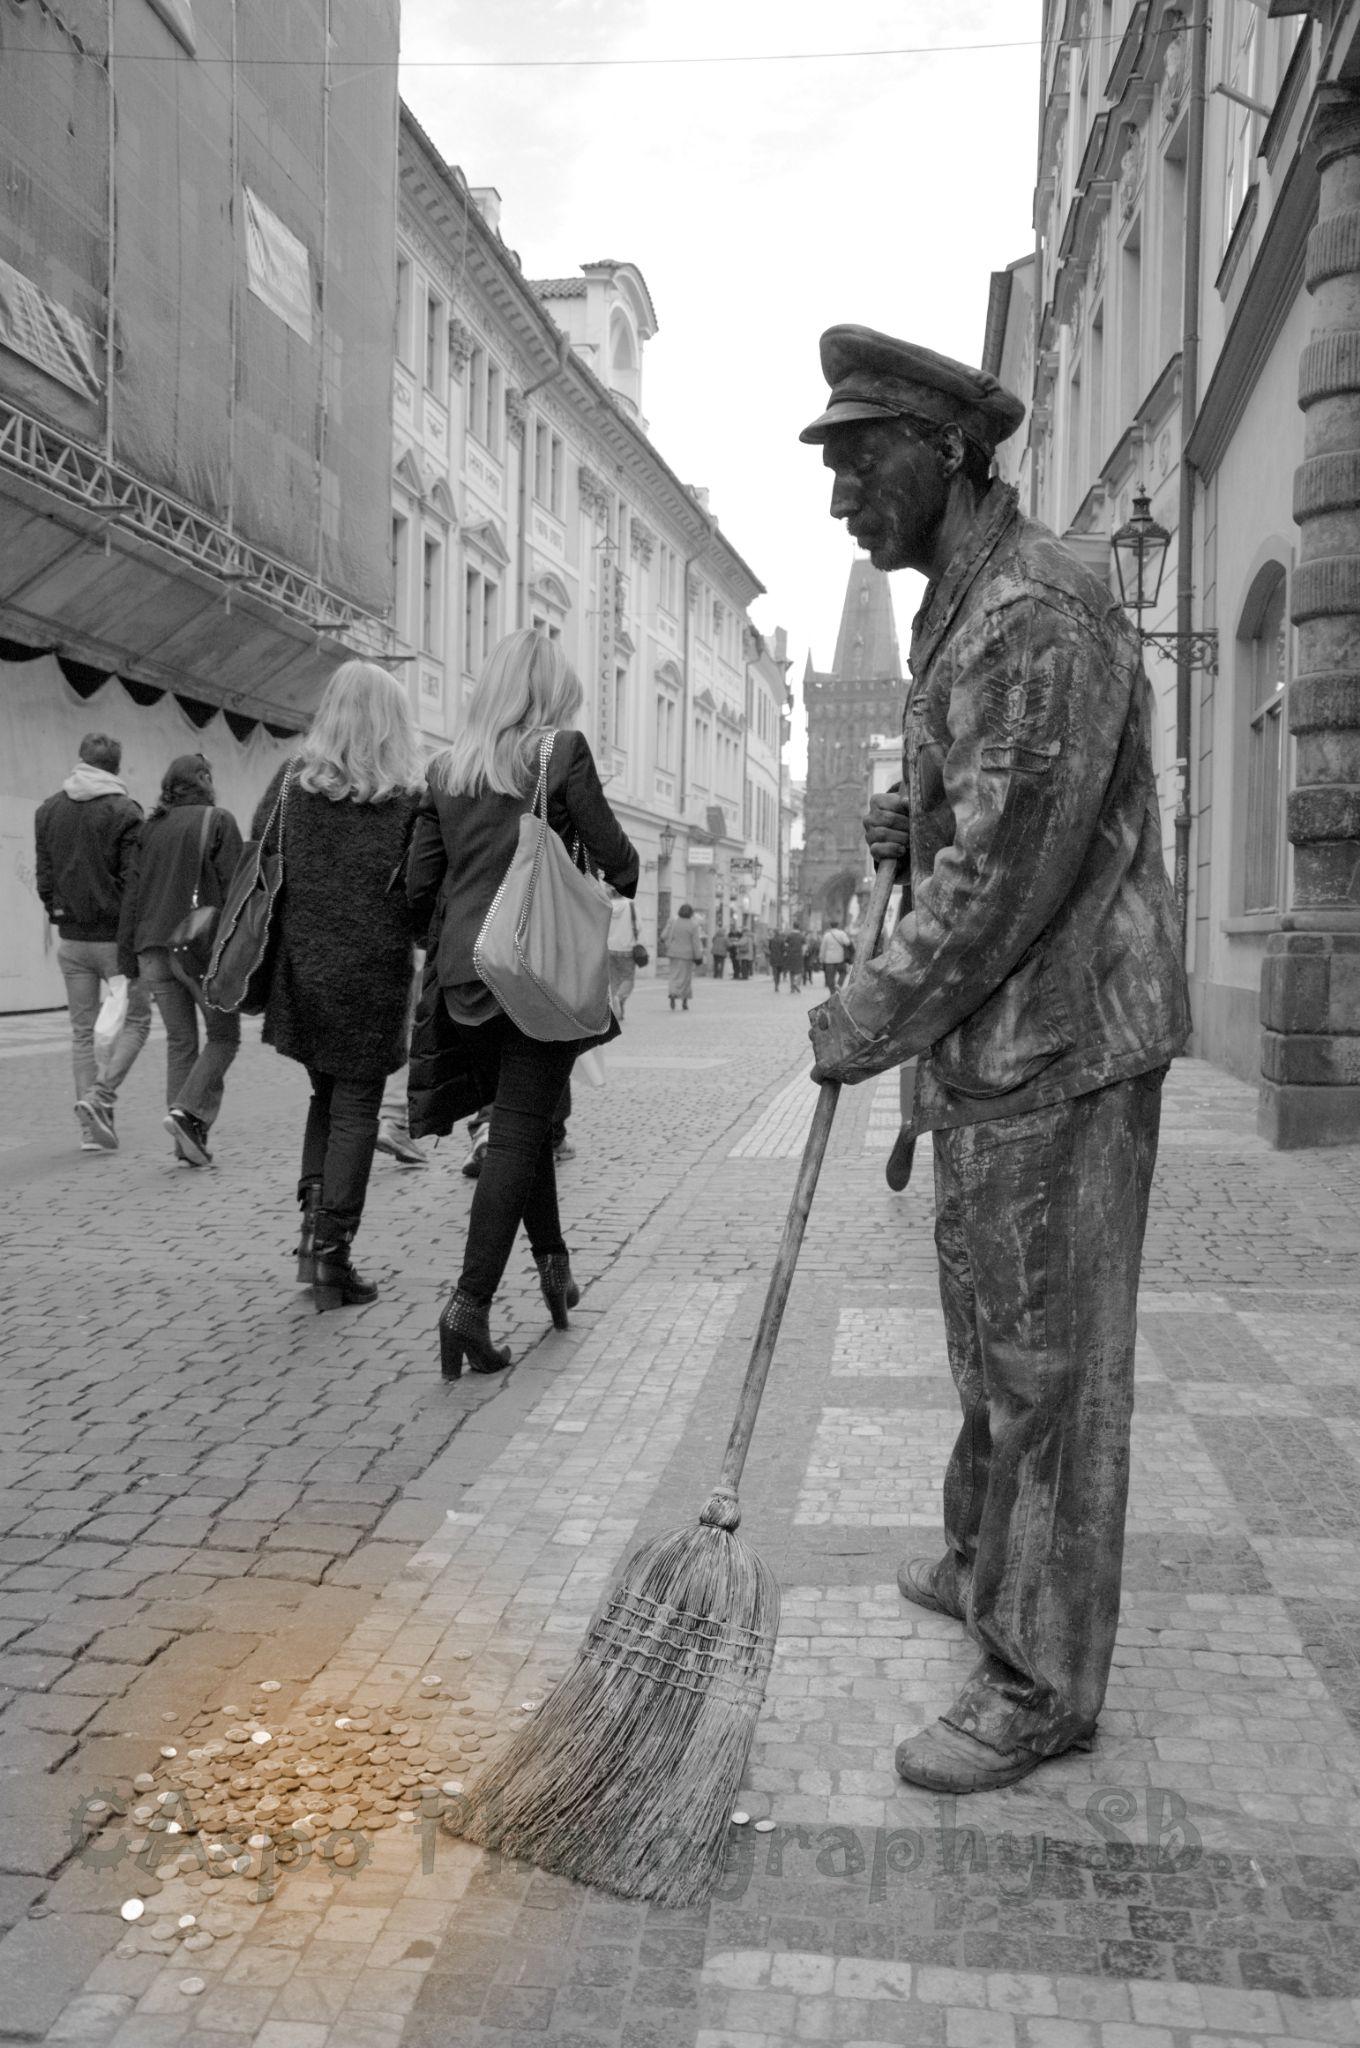 street by rastislavk1